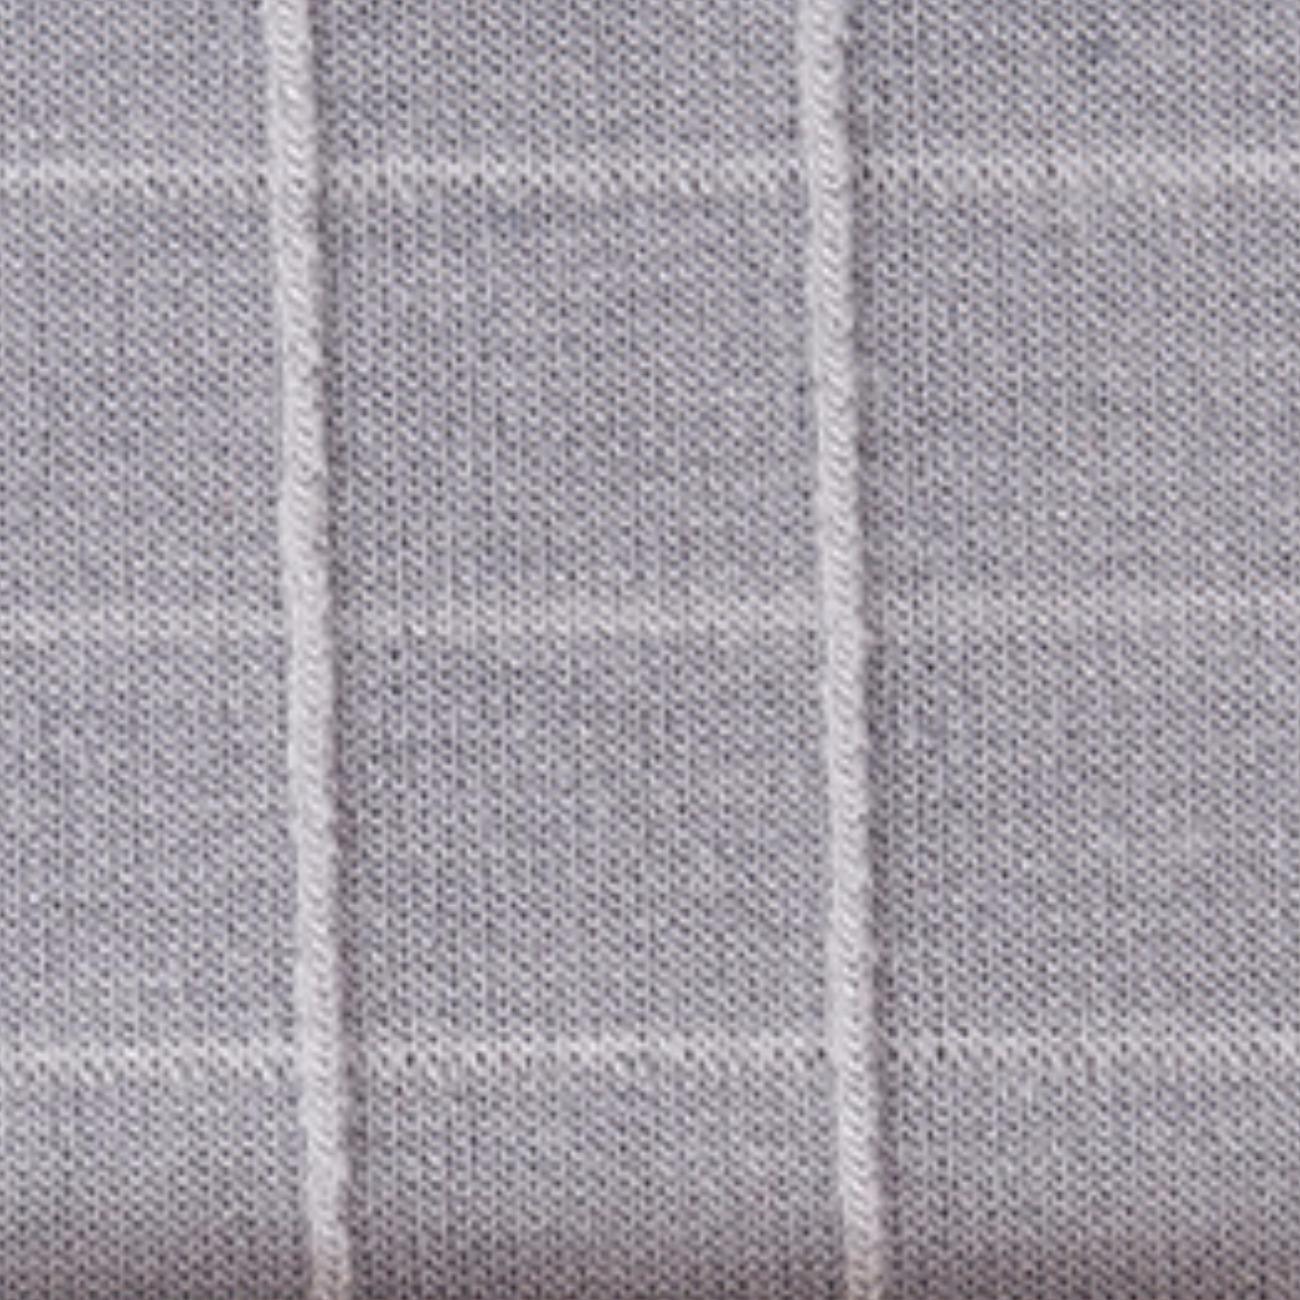 240g提花针织面料 2018春季棉涤女装面料弹力格子卫衣外套布料批